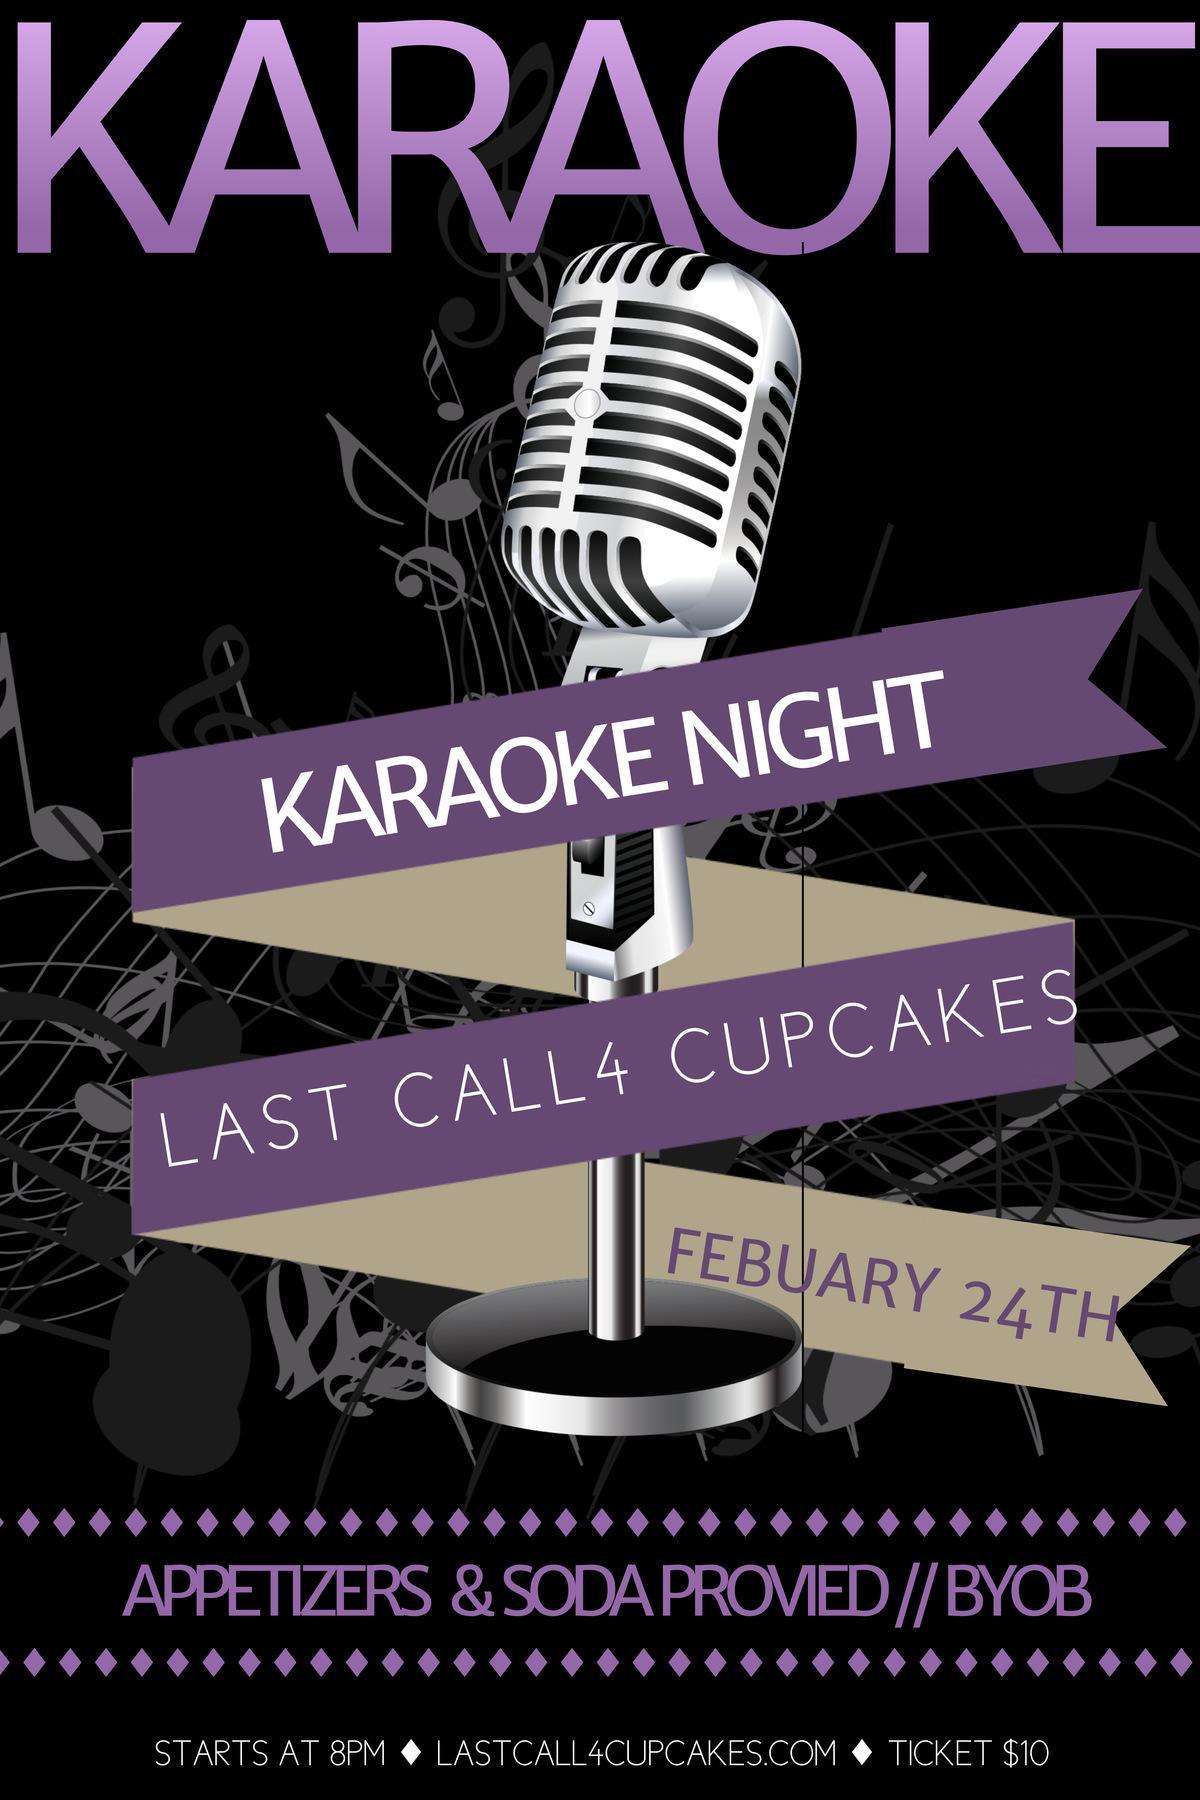 Join us for karaoke night